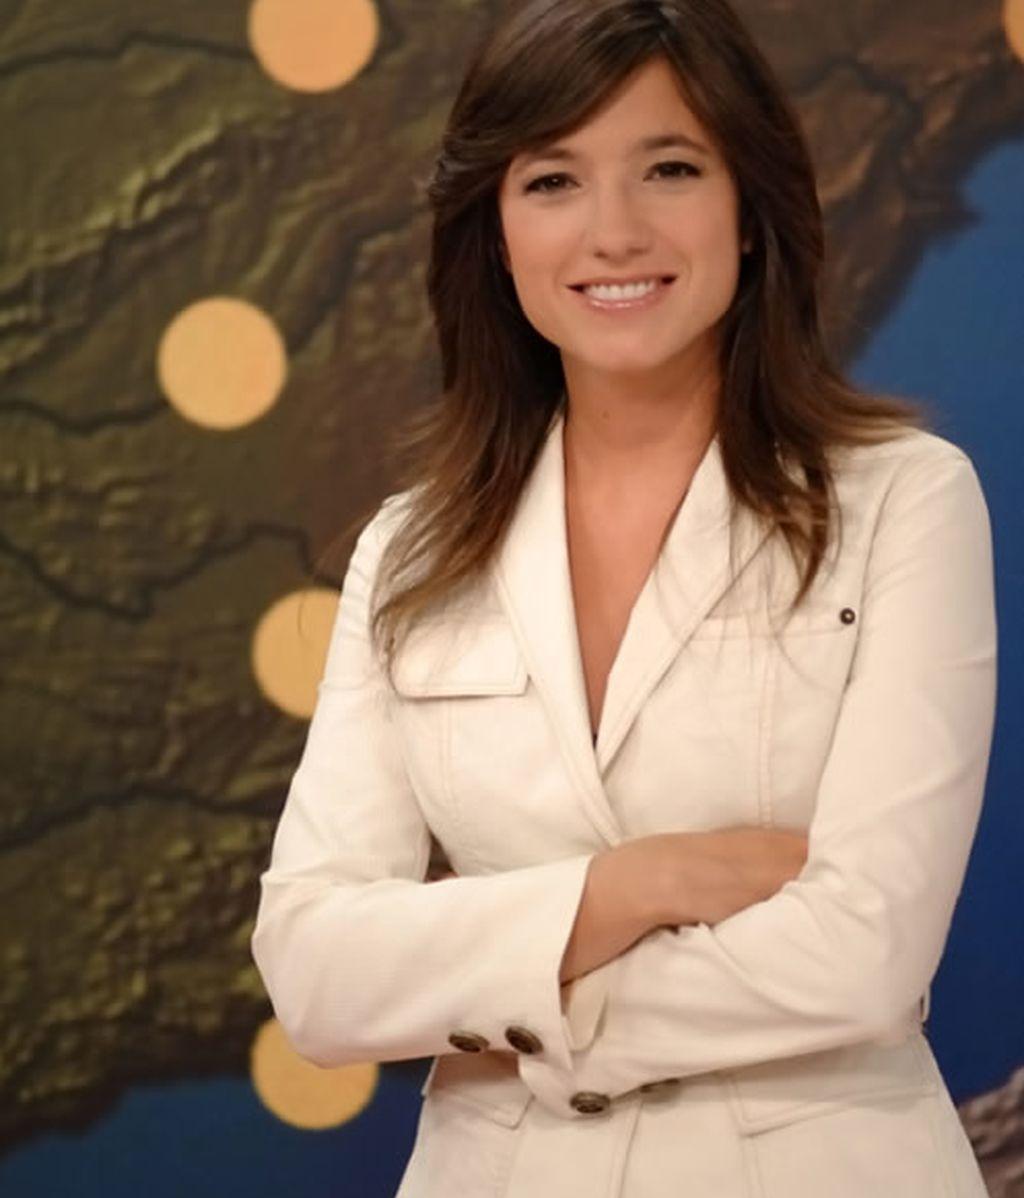 Mónica Sanz